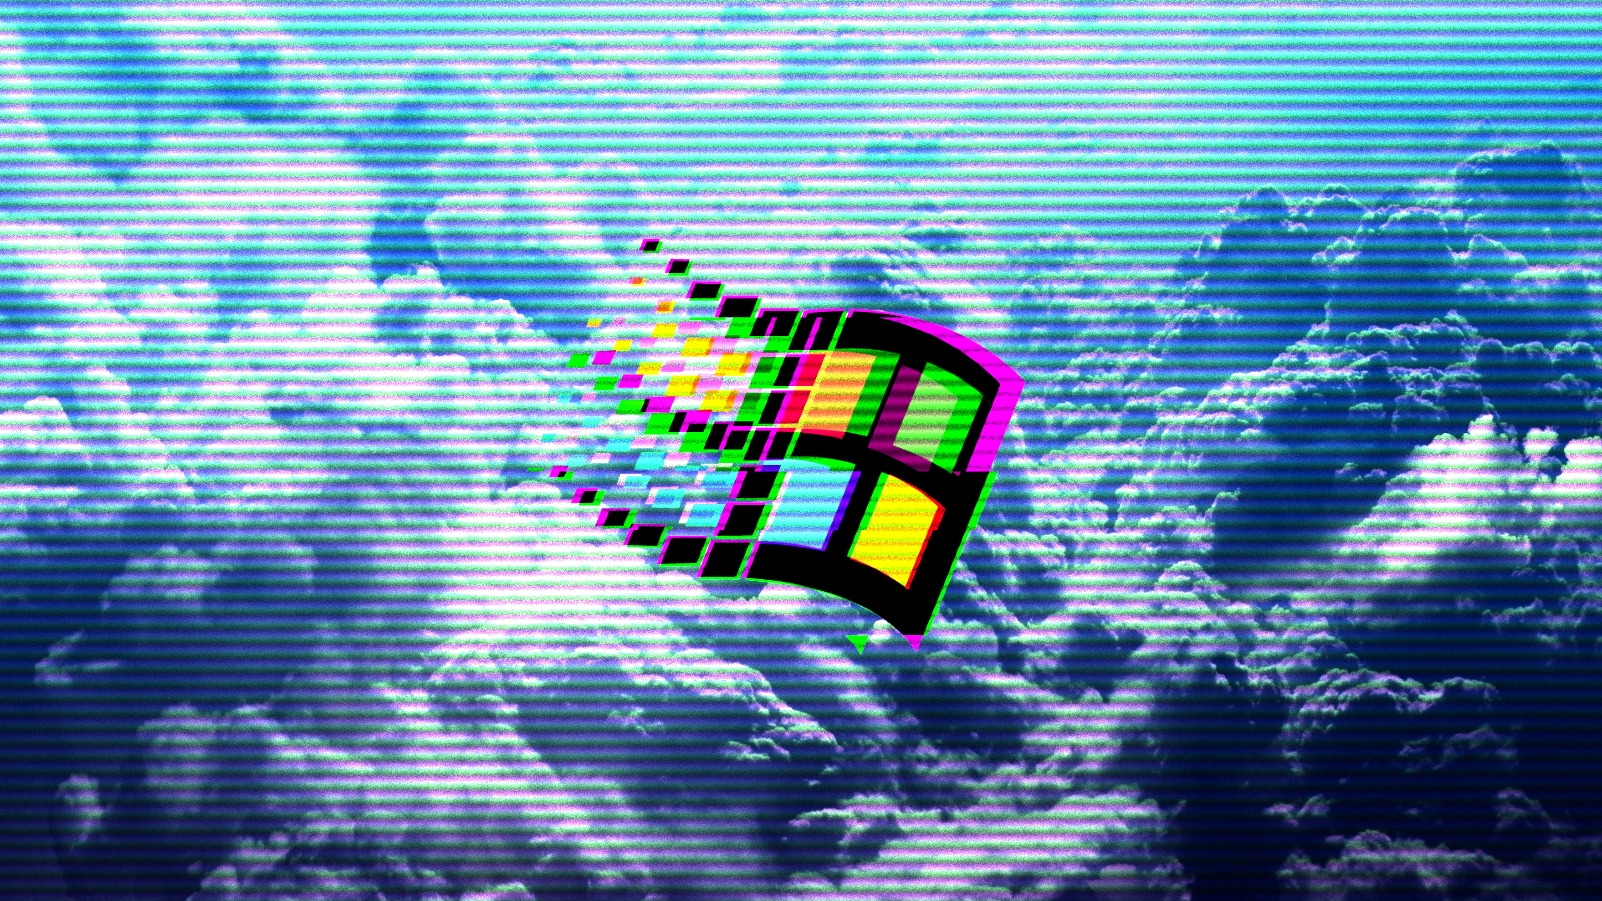 General 1602x901 vaporwave 1990s Windows 95 Windows 98 clouds